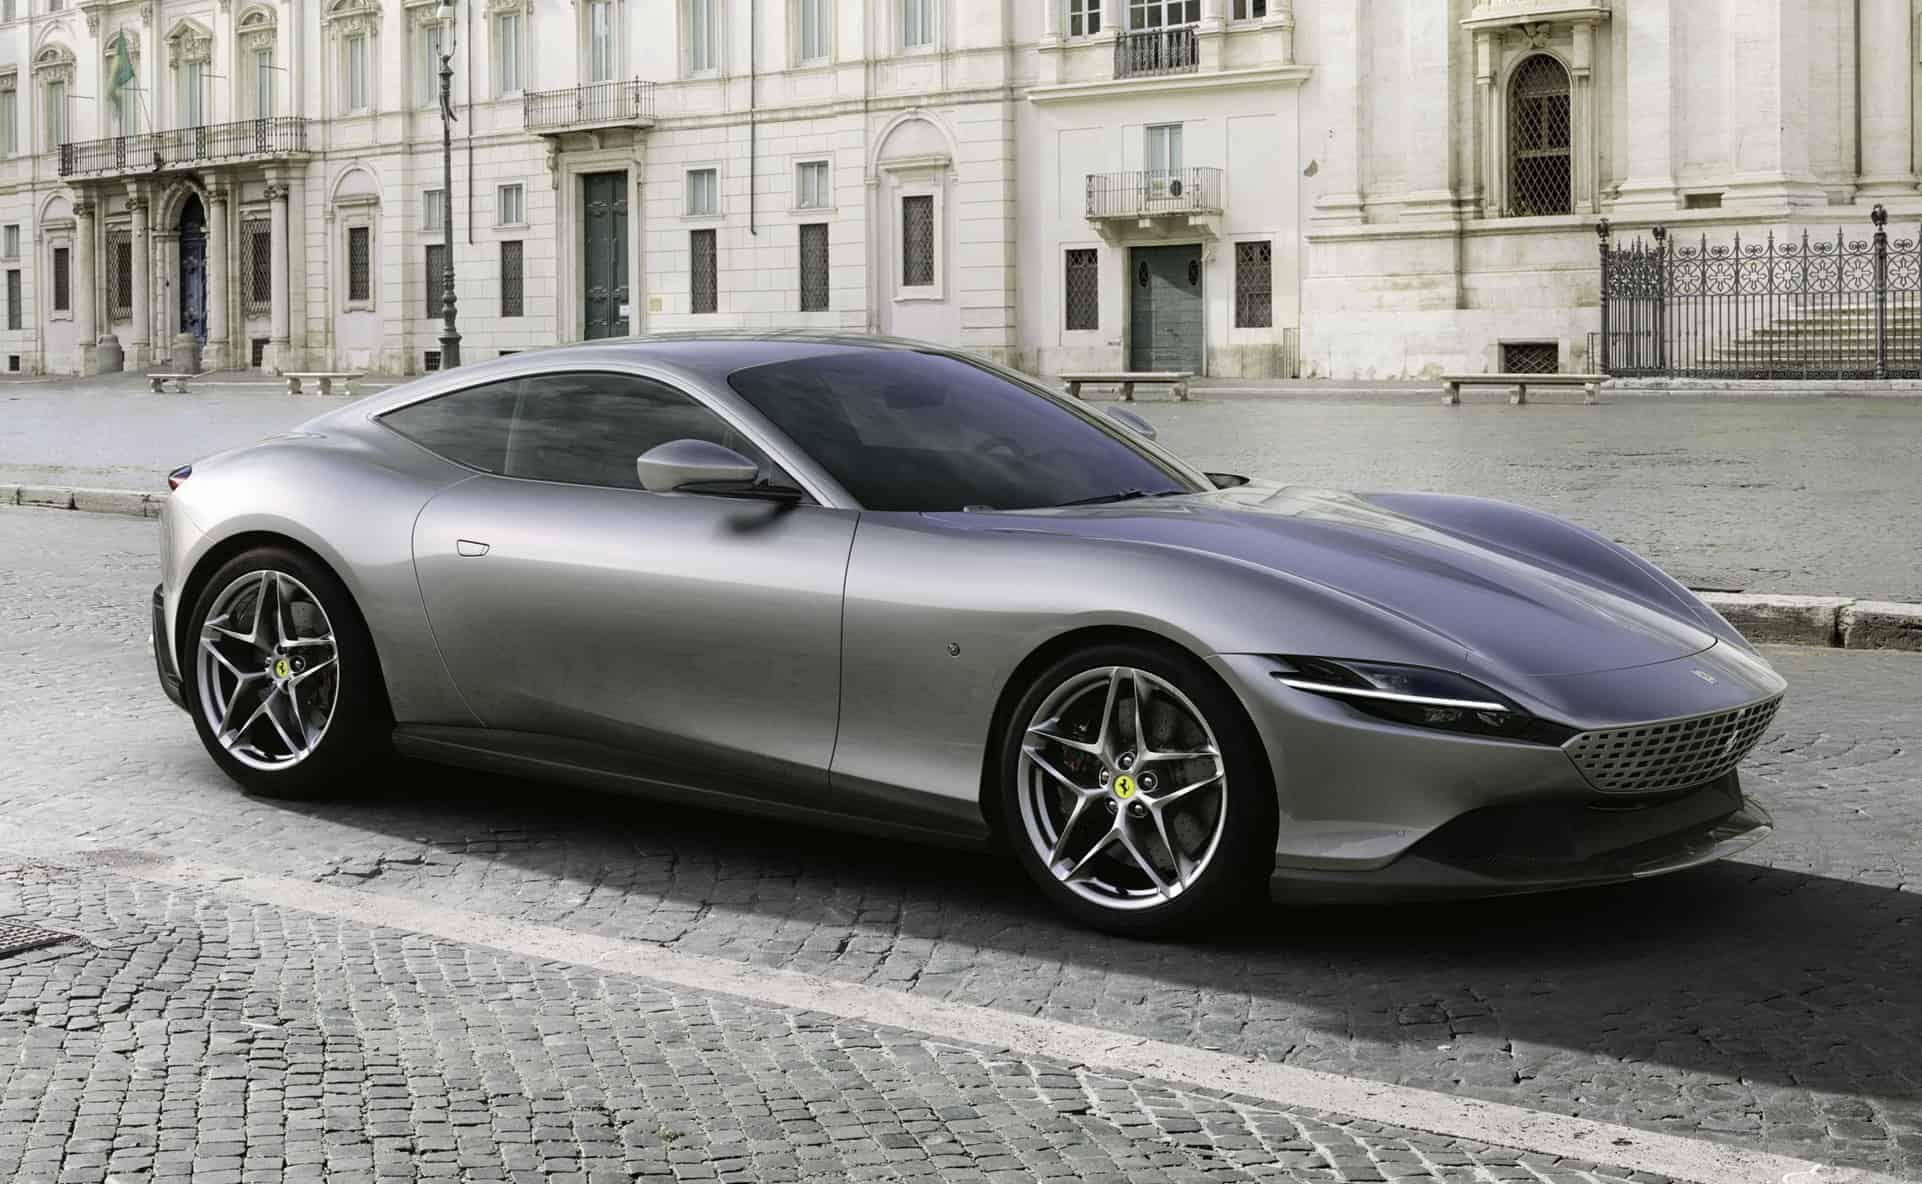 10 Wallpaper Ferrari Gt 2020 In 2020 Ferrari 488 Ferrari Race Cars